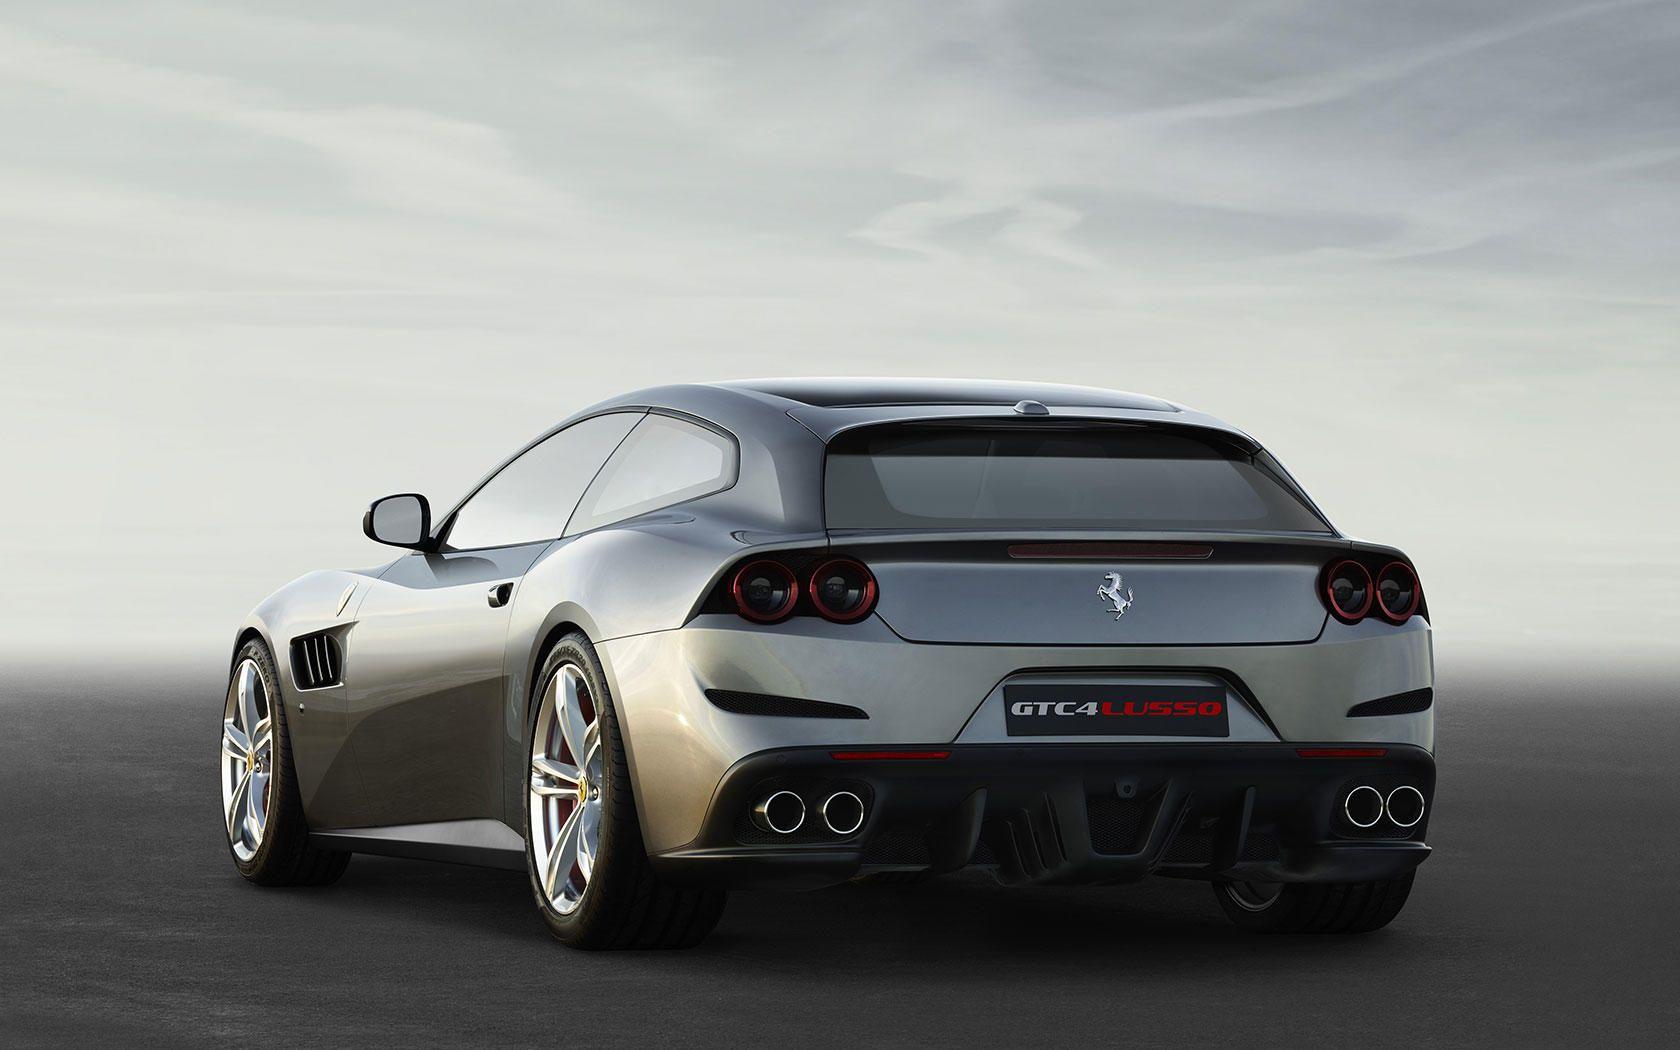 Ferrari Debuts Its Newest Four Wheel Drive Hatch The Gtc4lusso Ferrari Car Geneva Motor Show Ferrari